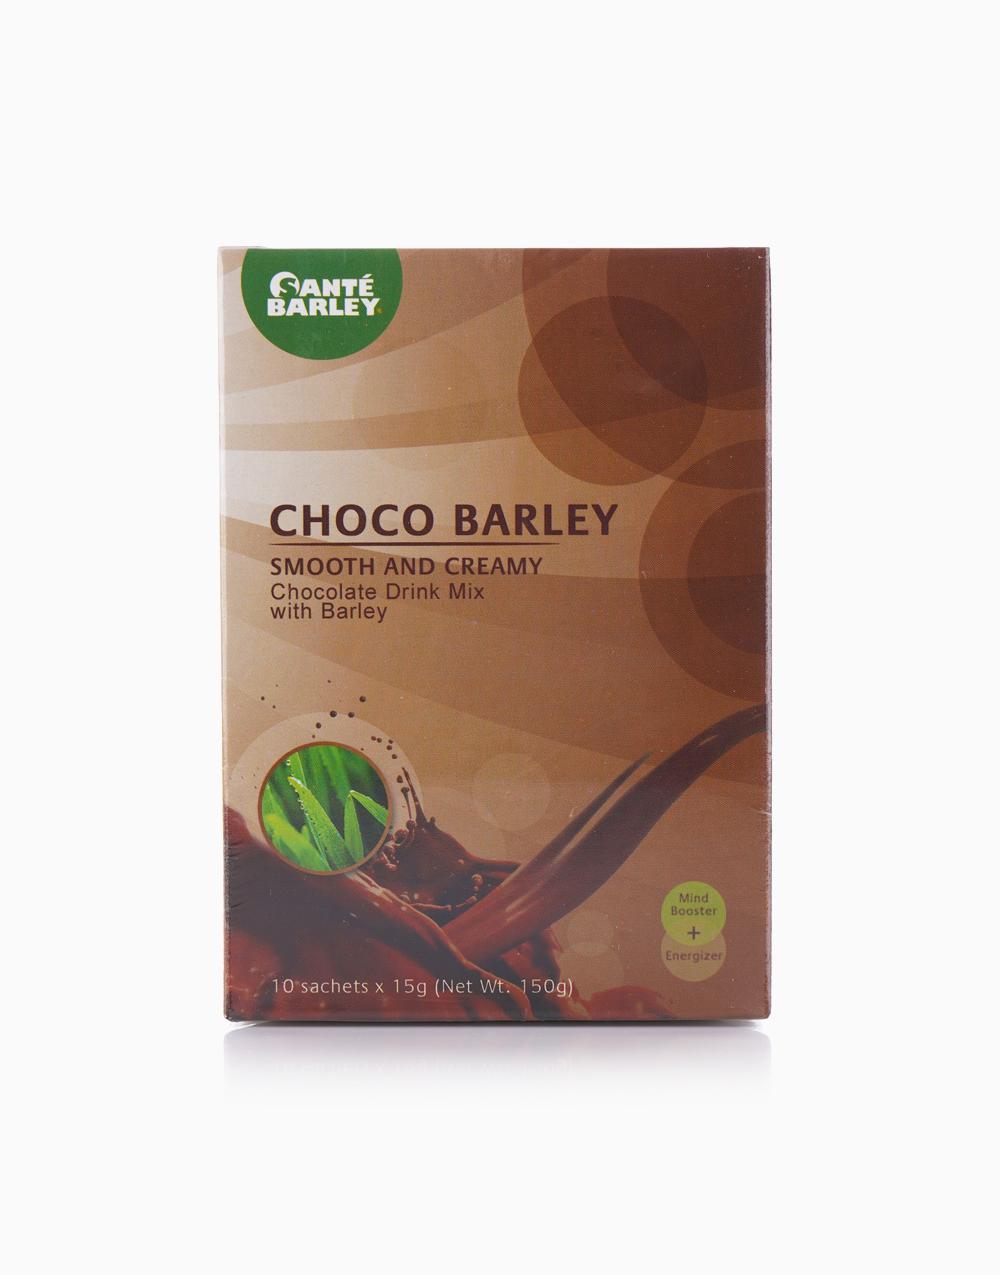 Choco Barley Smooth and Creamy Chocolate Drink Mix with Barley (10 Sachets, 15g) by Santé Barley